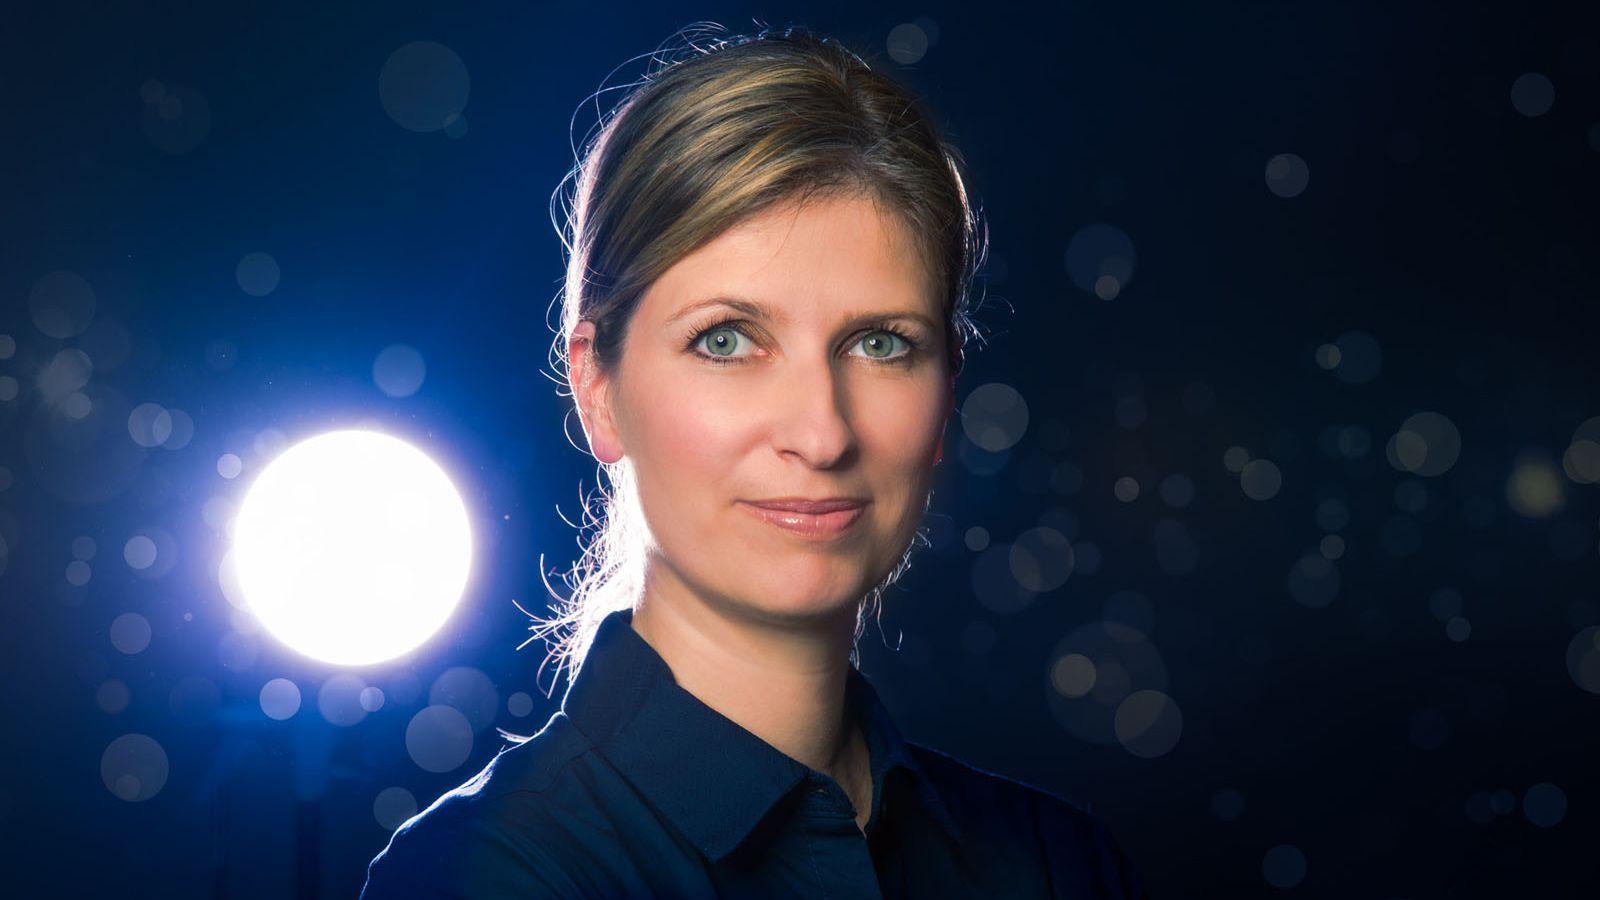 Super-PR-Natalie-Wimberger-wird-Head-of-Content-Formatentwicklung